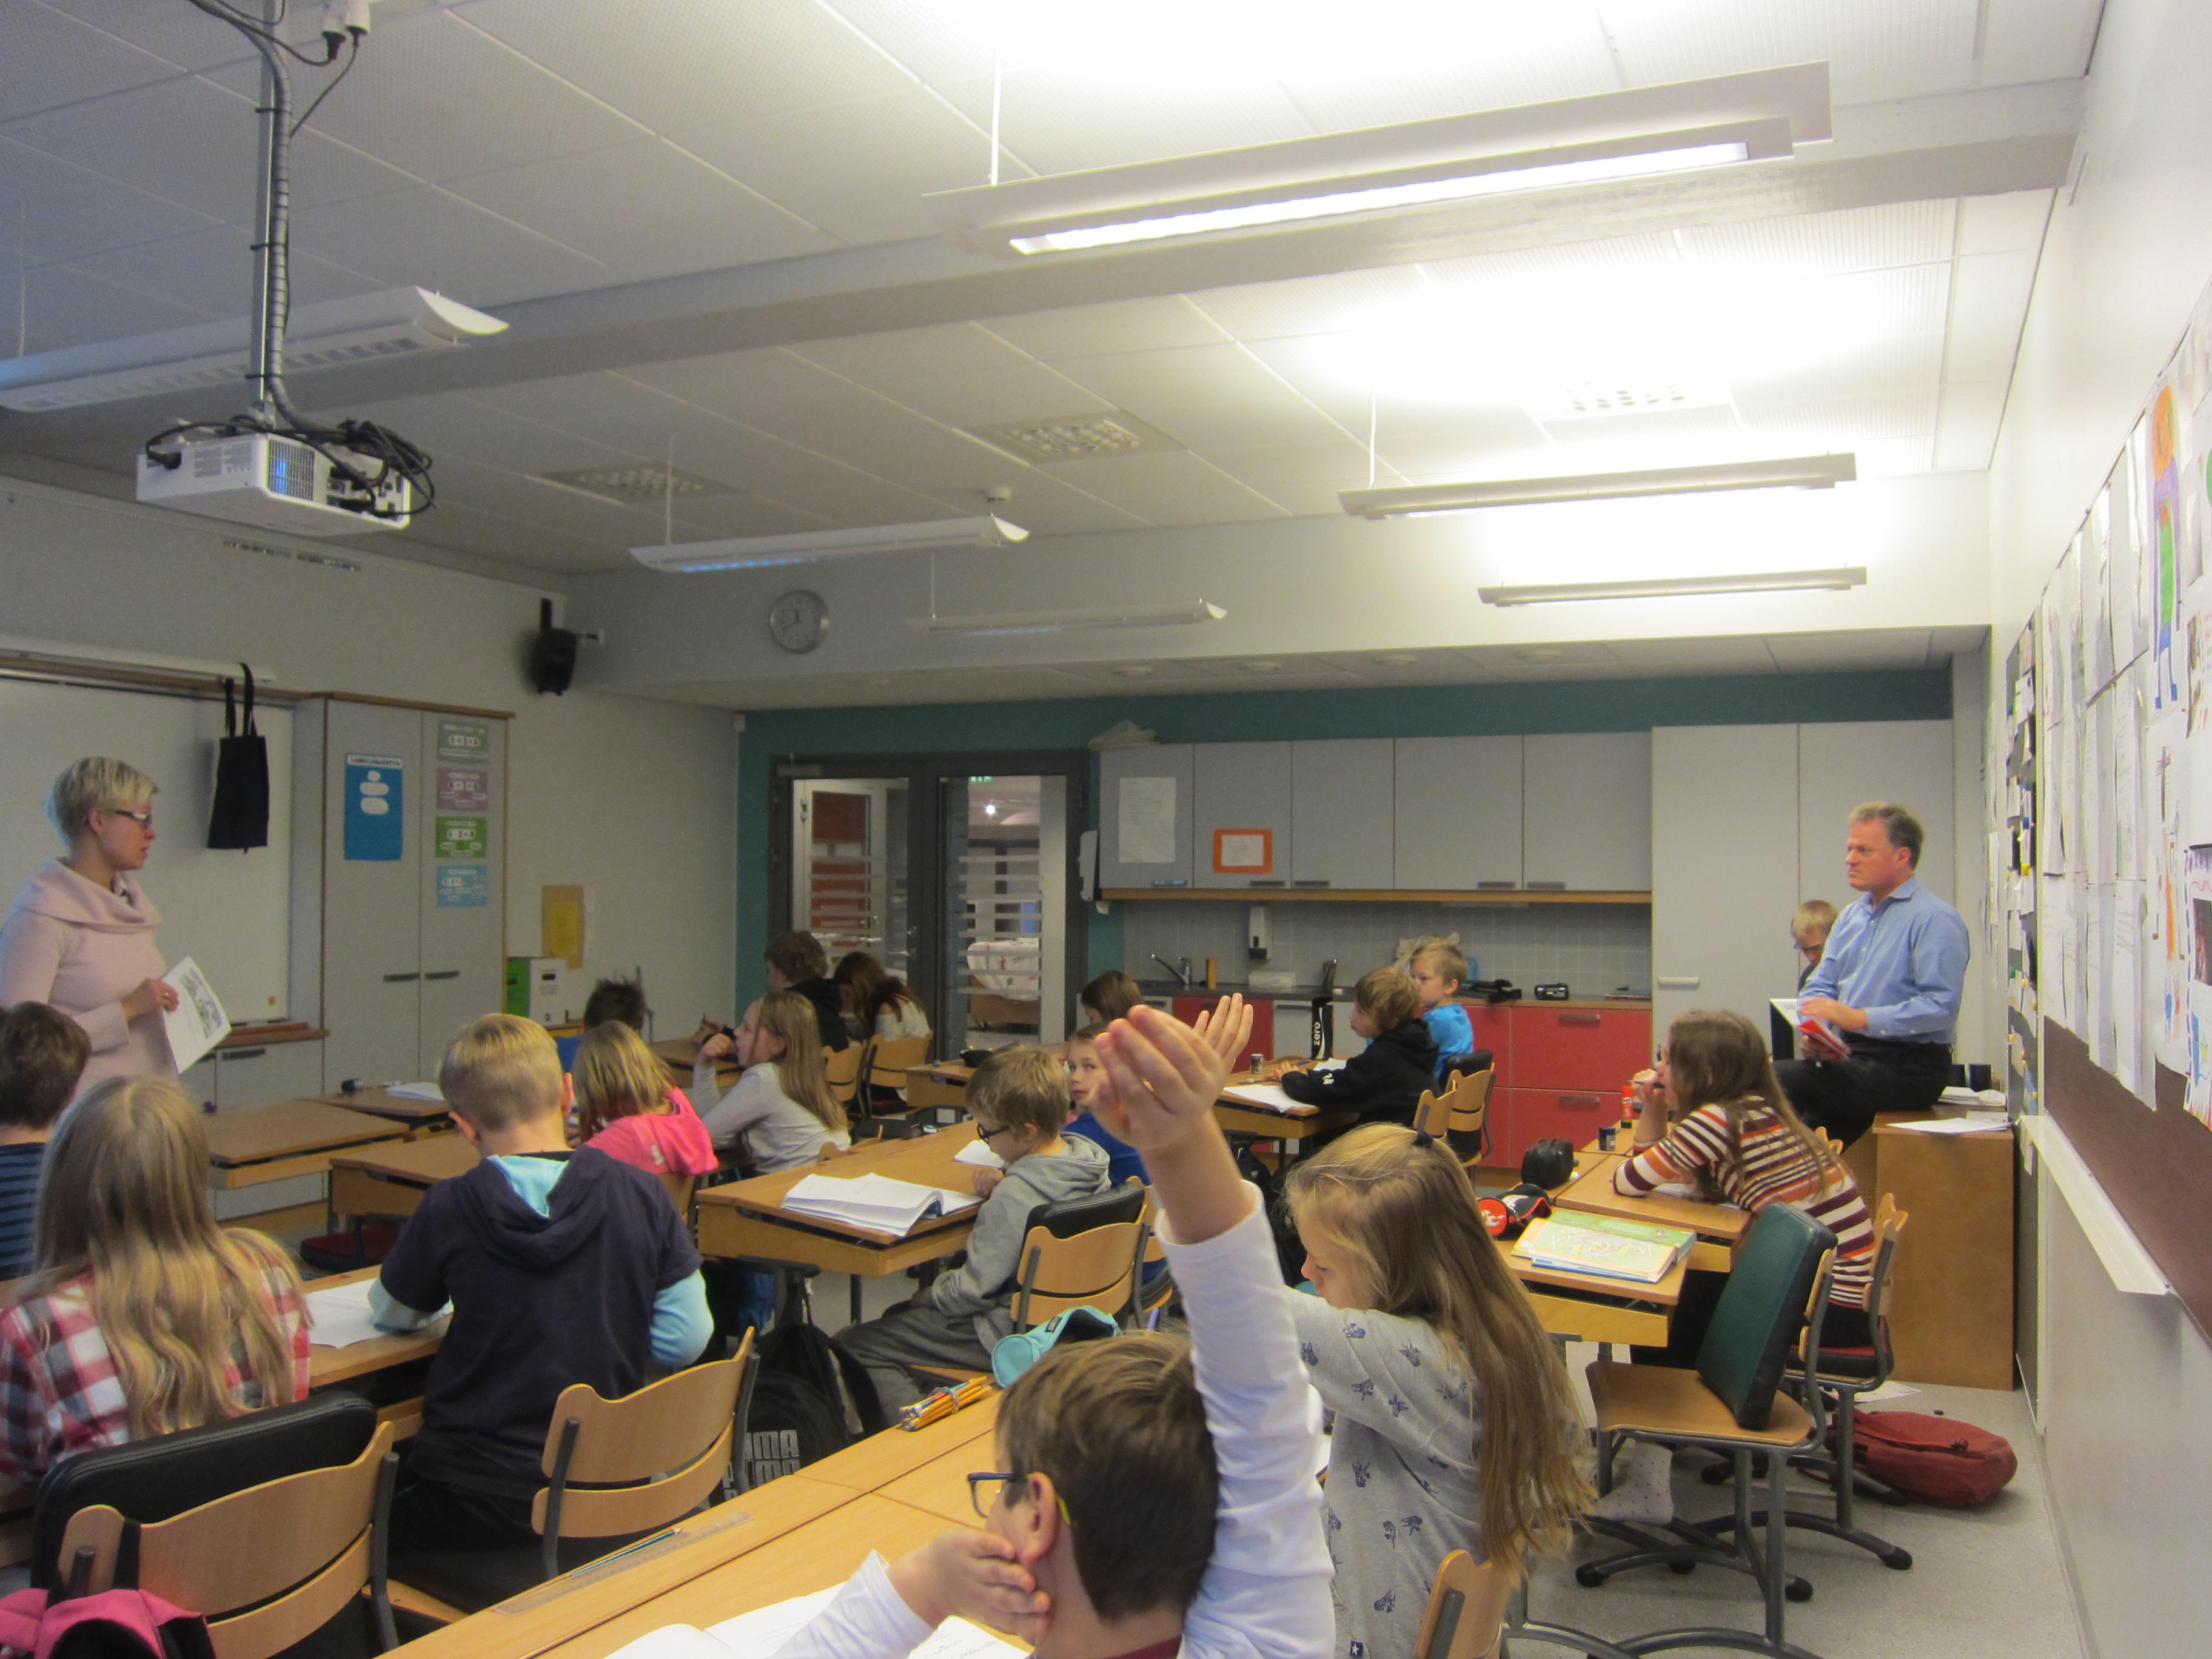 Sala de clasa intr-o scoala din Finlanda